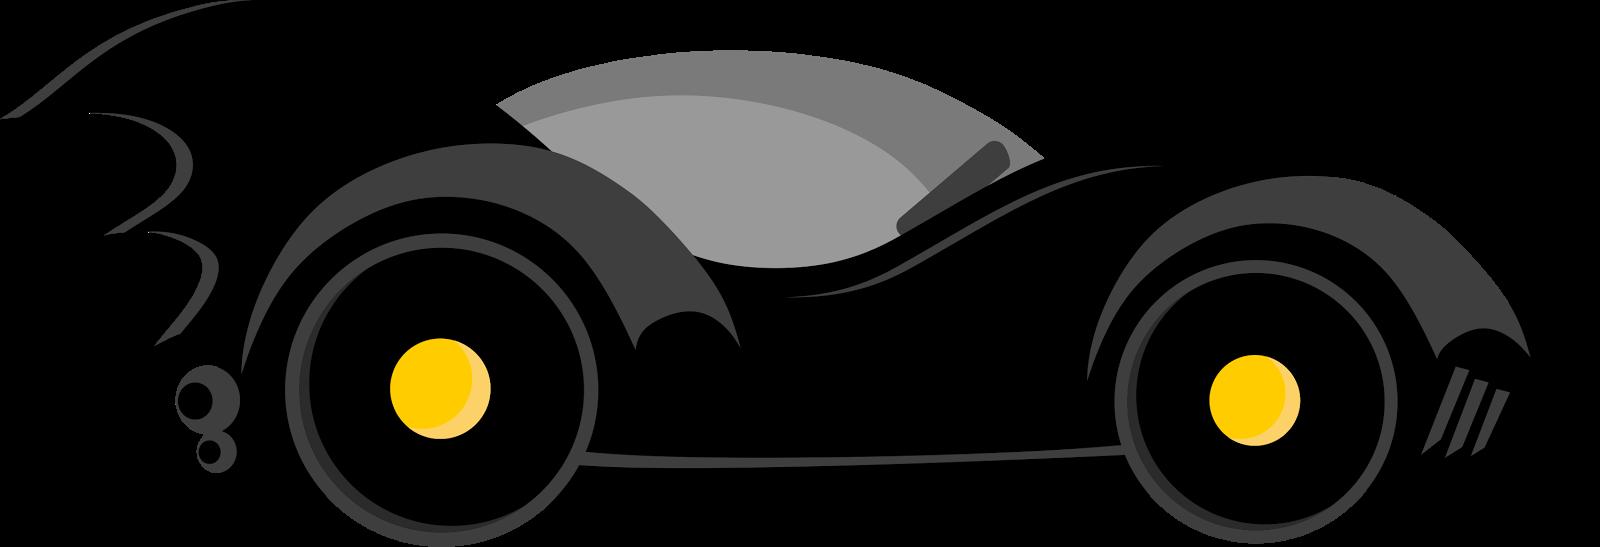 Clipart car superhero. Batman transparent background batcar